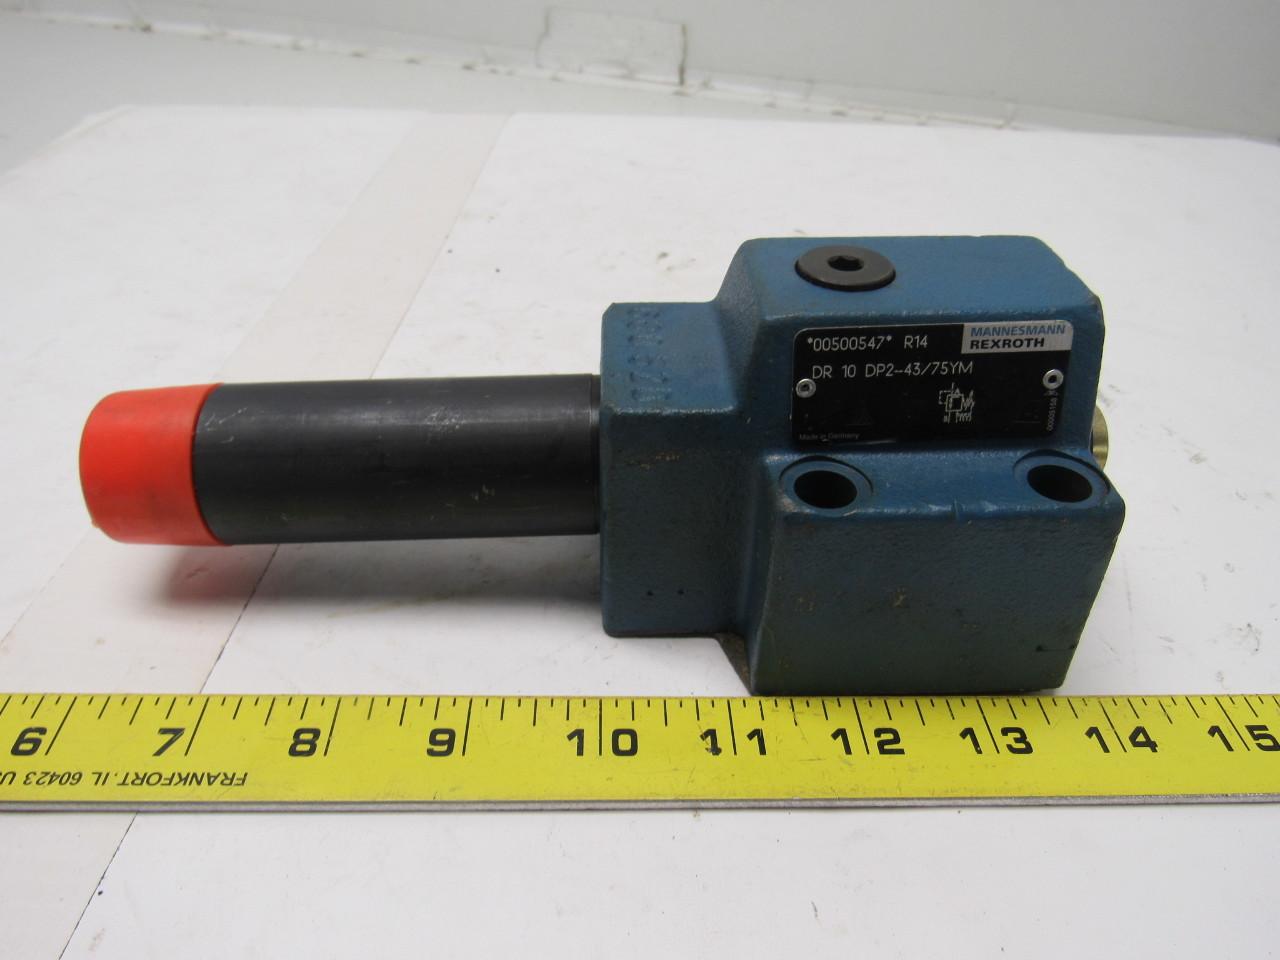 Rexroth DR-10-DP2-43/75YM Pressure Reducing Valve  1090 PSI (75 bar)